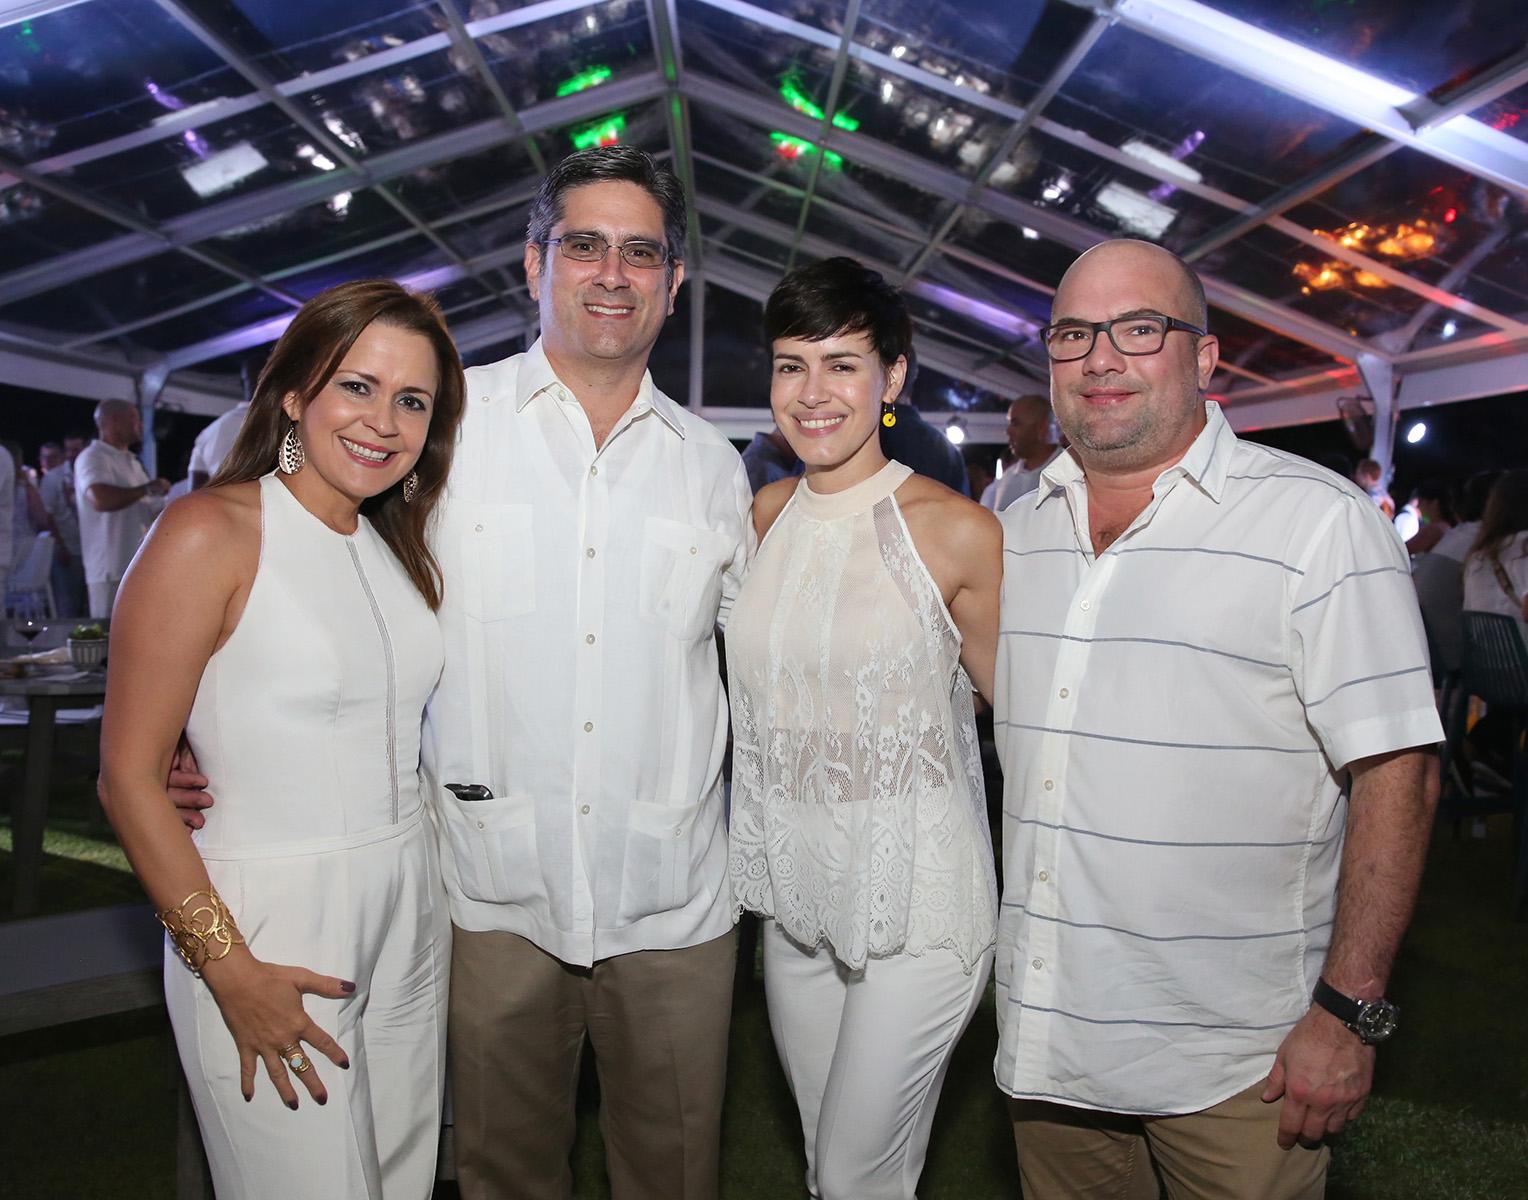 Bonnie Bandas, Antonio Fernós, Melanie y José Aponte. (José R. Pérez Centeno)